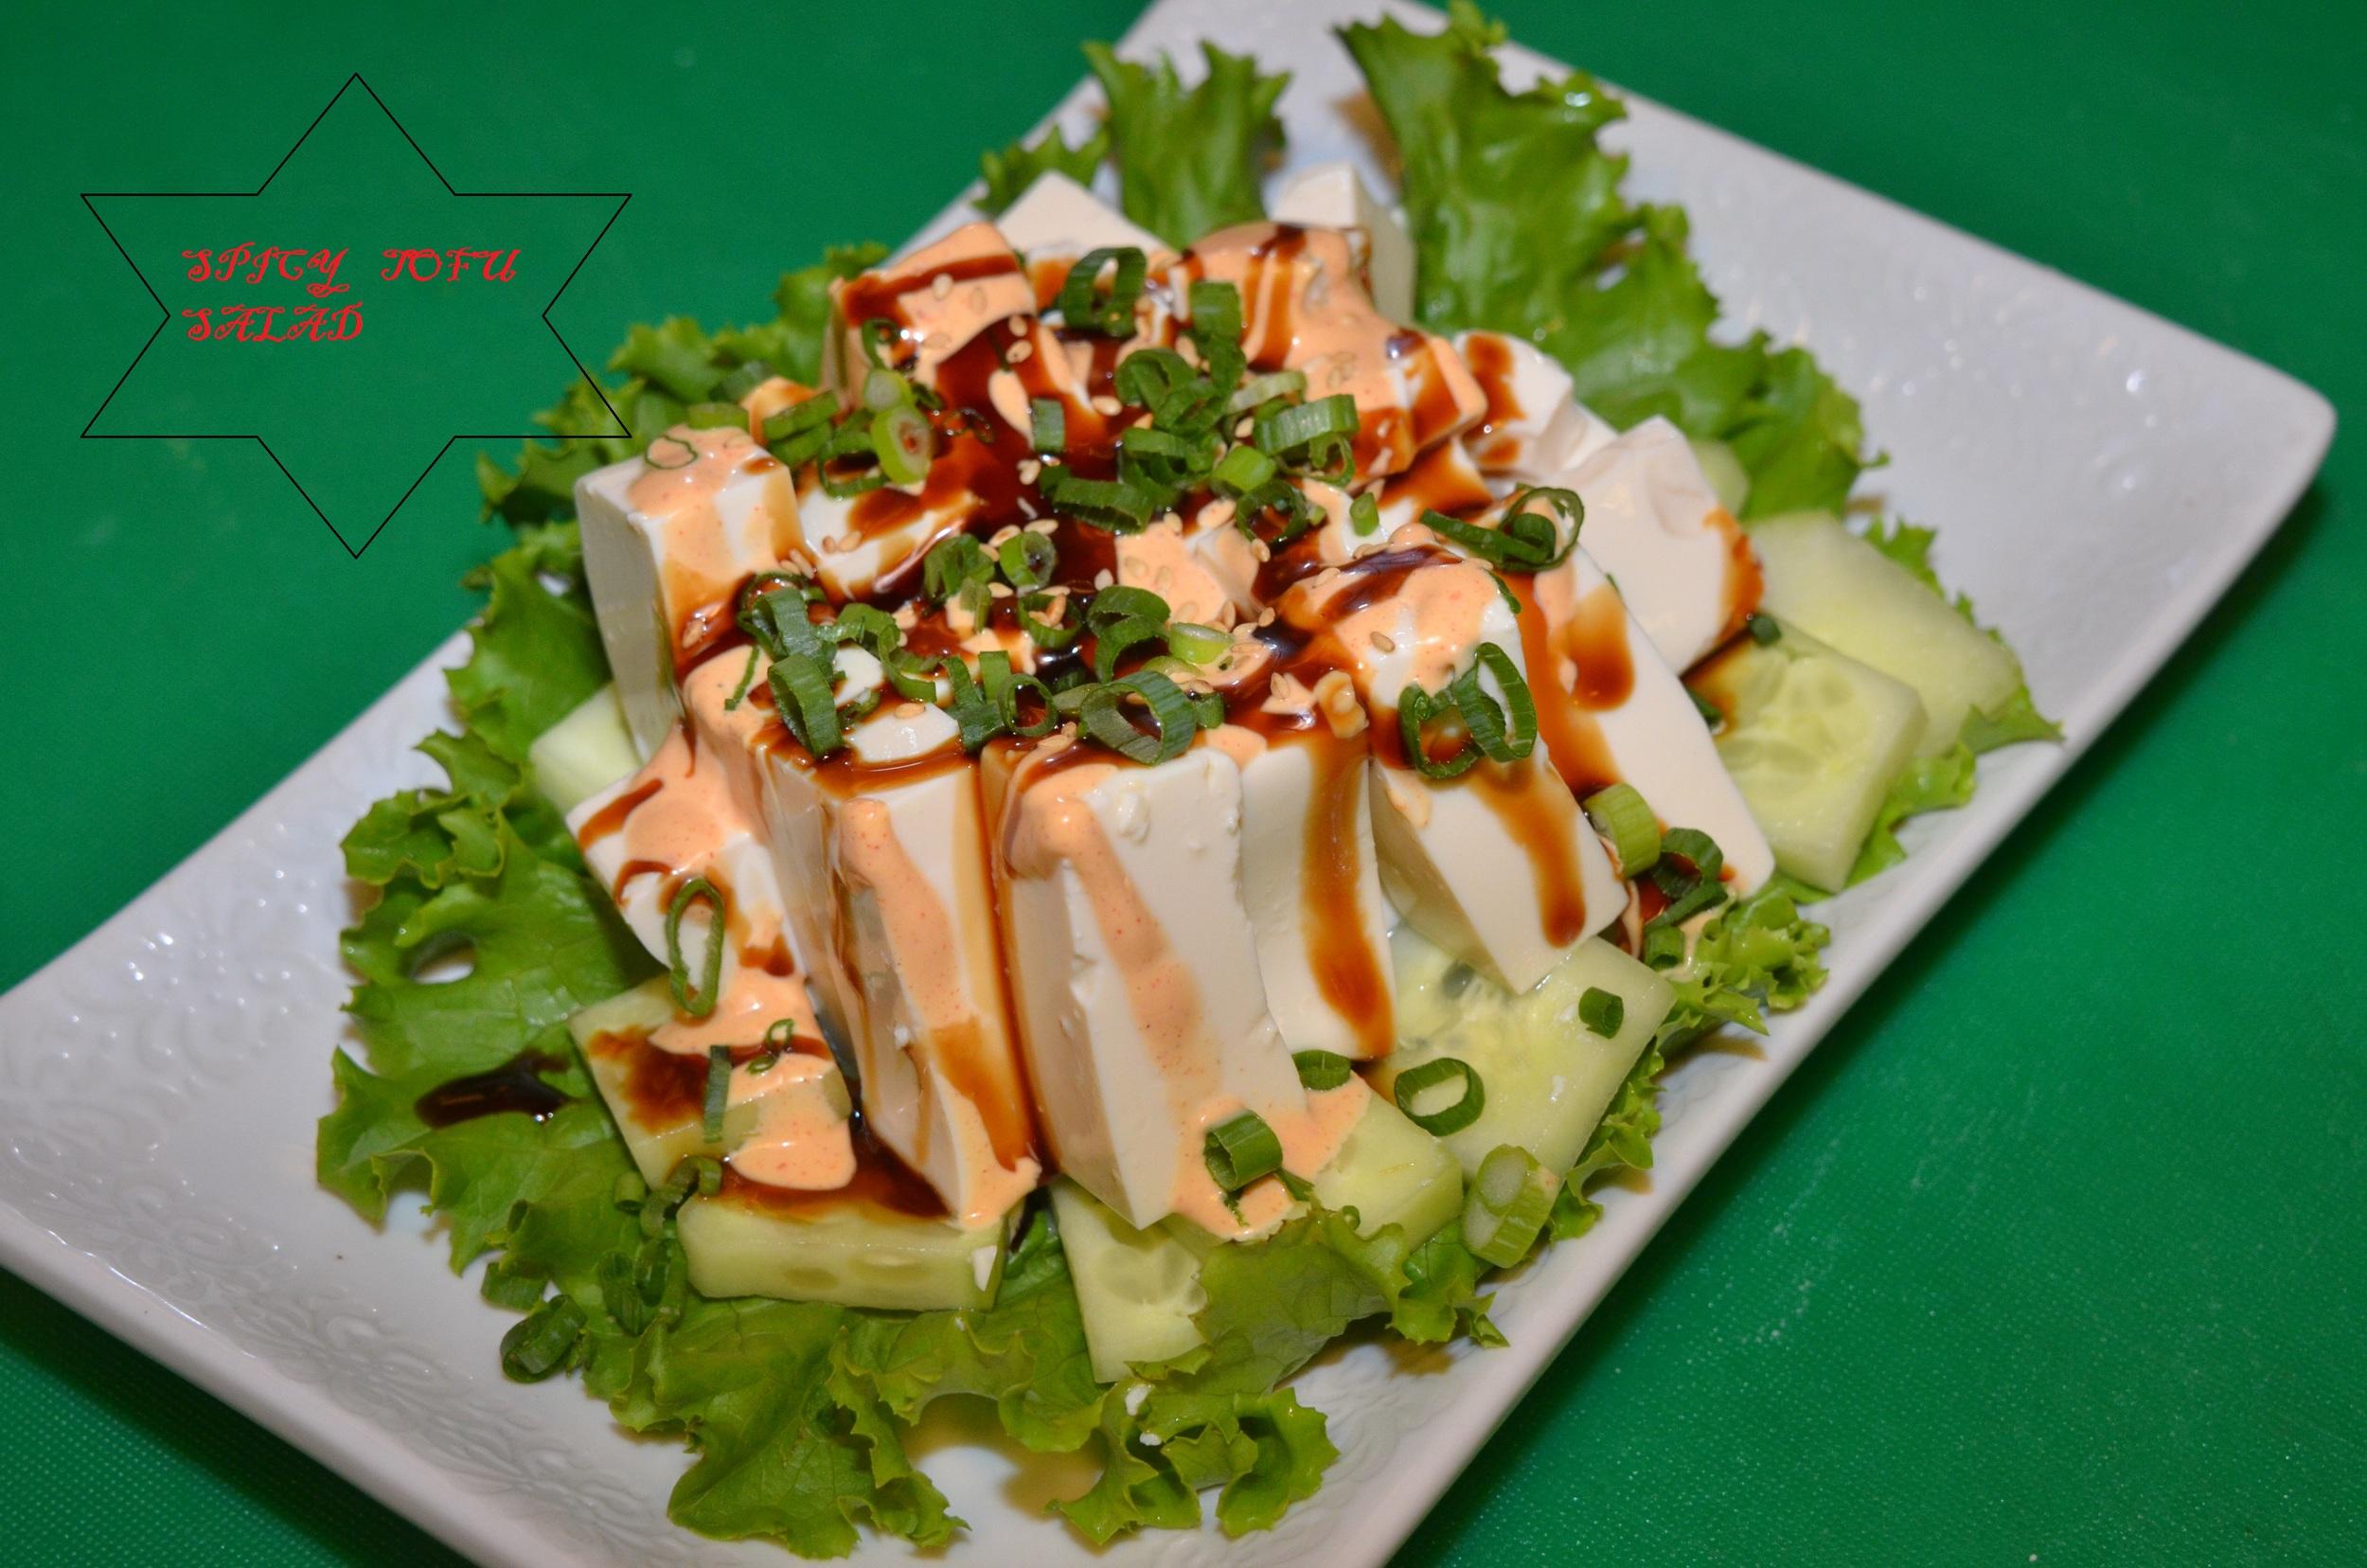 Spicy Tofu Salad.JPG